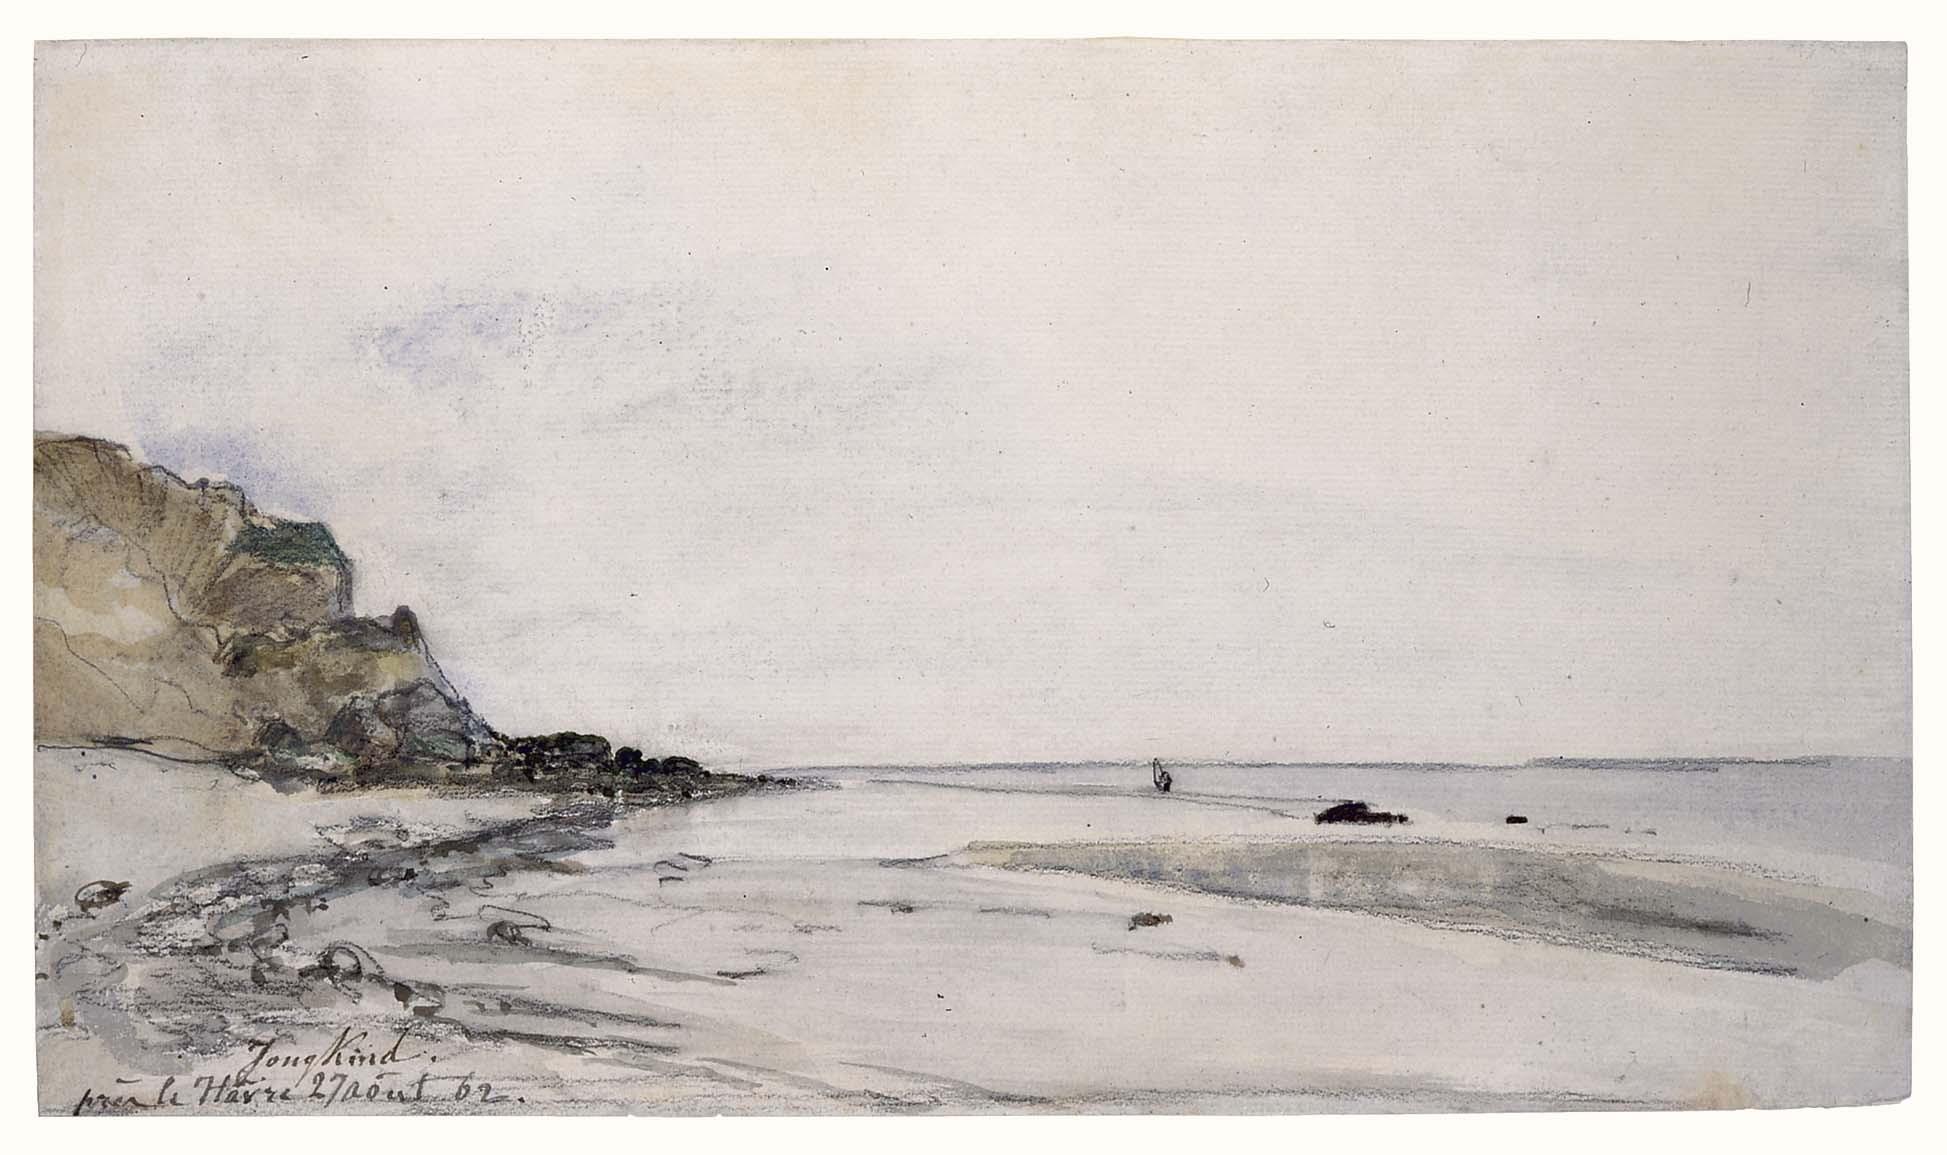 Johan Barthold Jongkind, Le Havre, 1862, Paris, Fondation Custodia (Collection Frits Lugt)